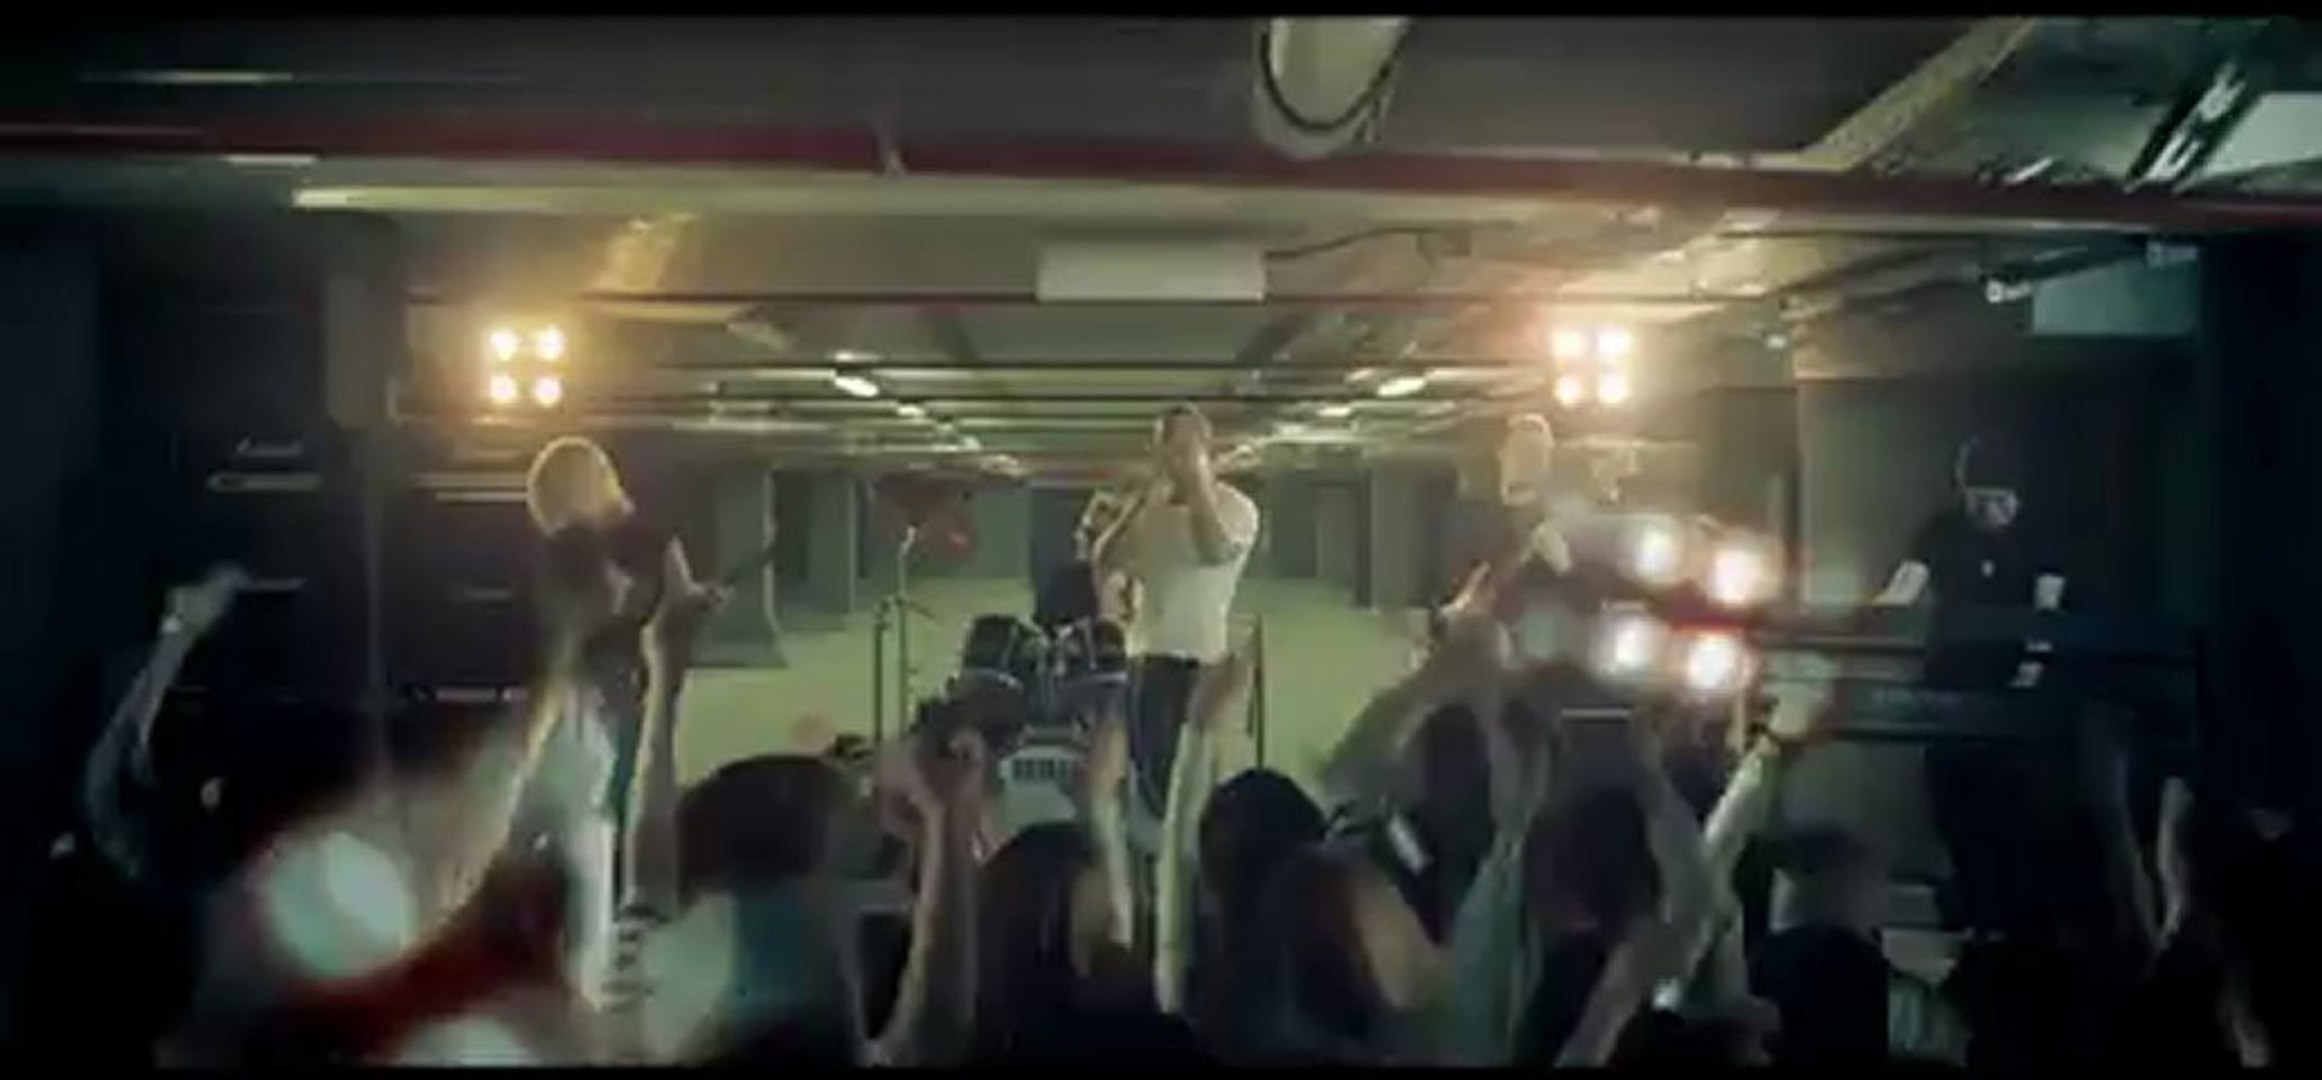 SASA KOVACEVIC - Piši propalo (Official Video) NOVO! 2013